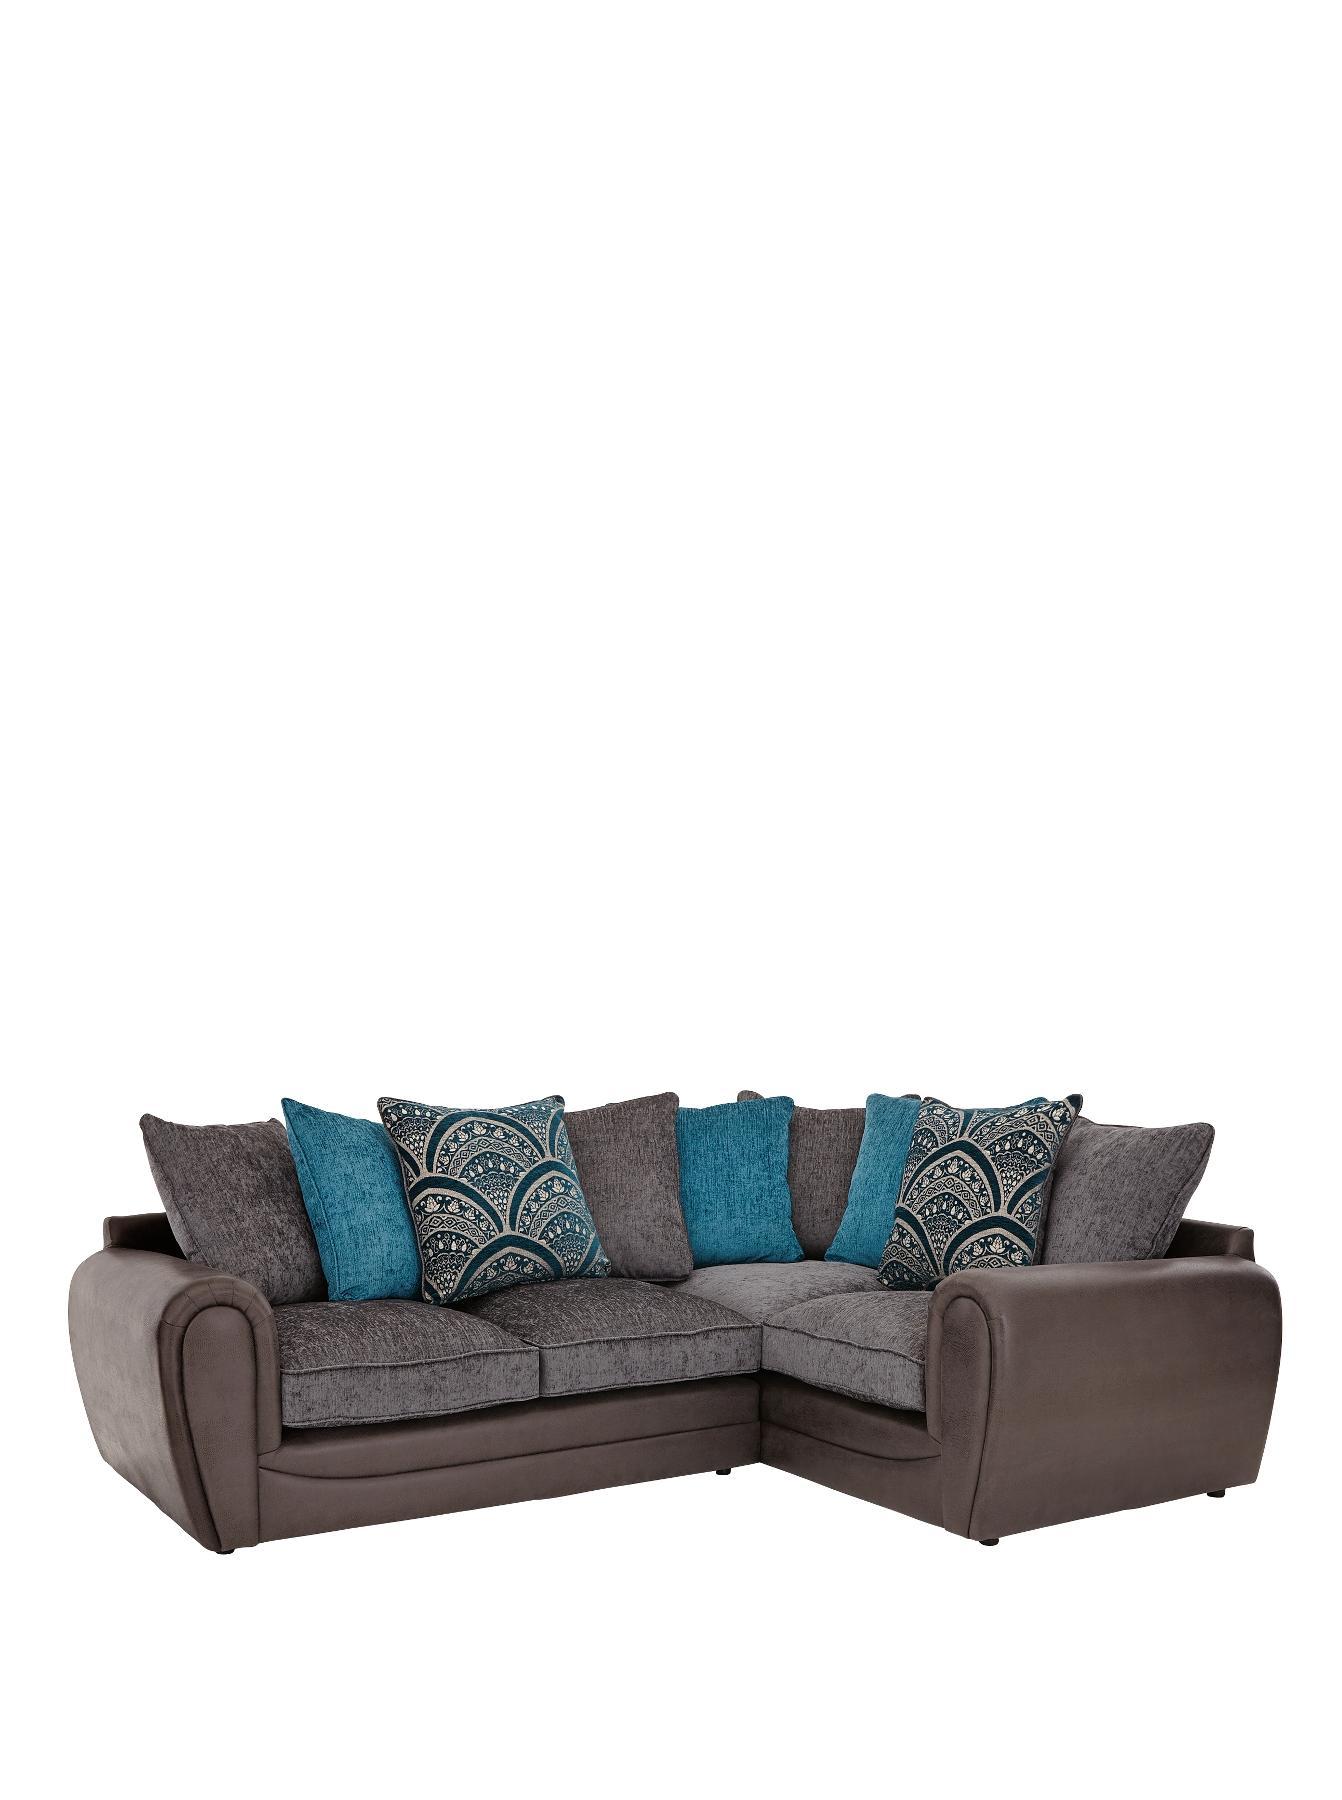 Gatsby Right-Hand Double-Arm Corner Group Sofa, Grey,Chocolate,Black